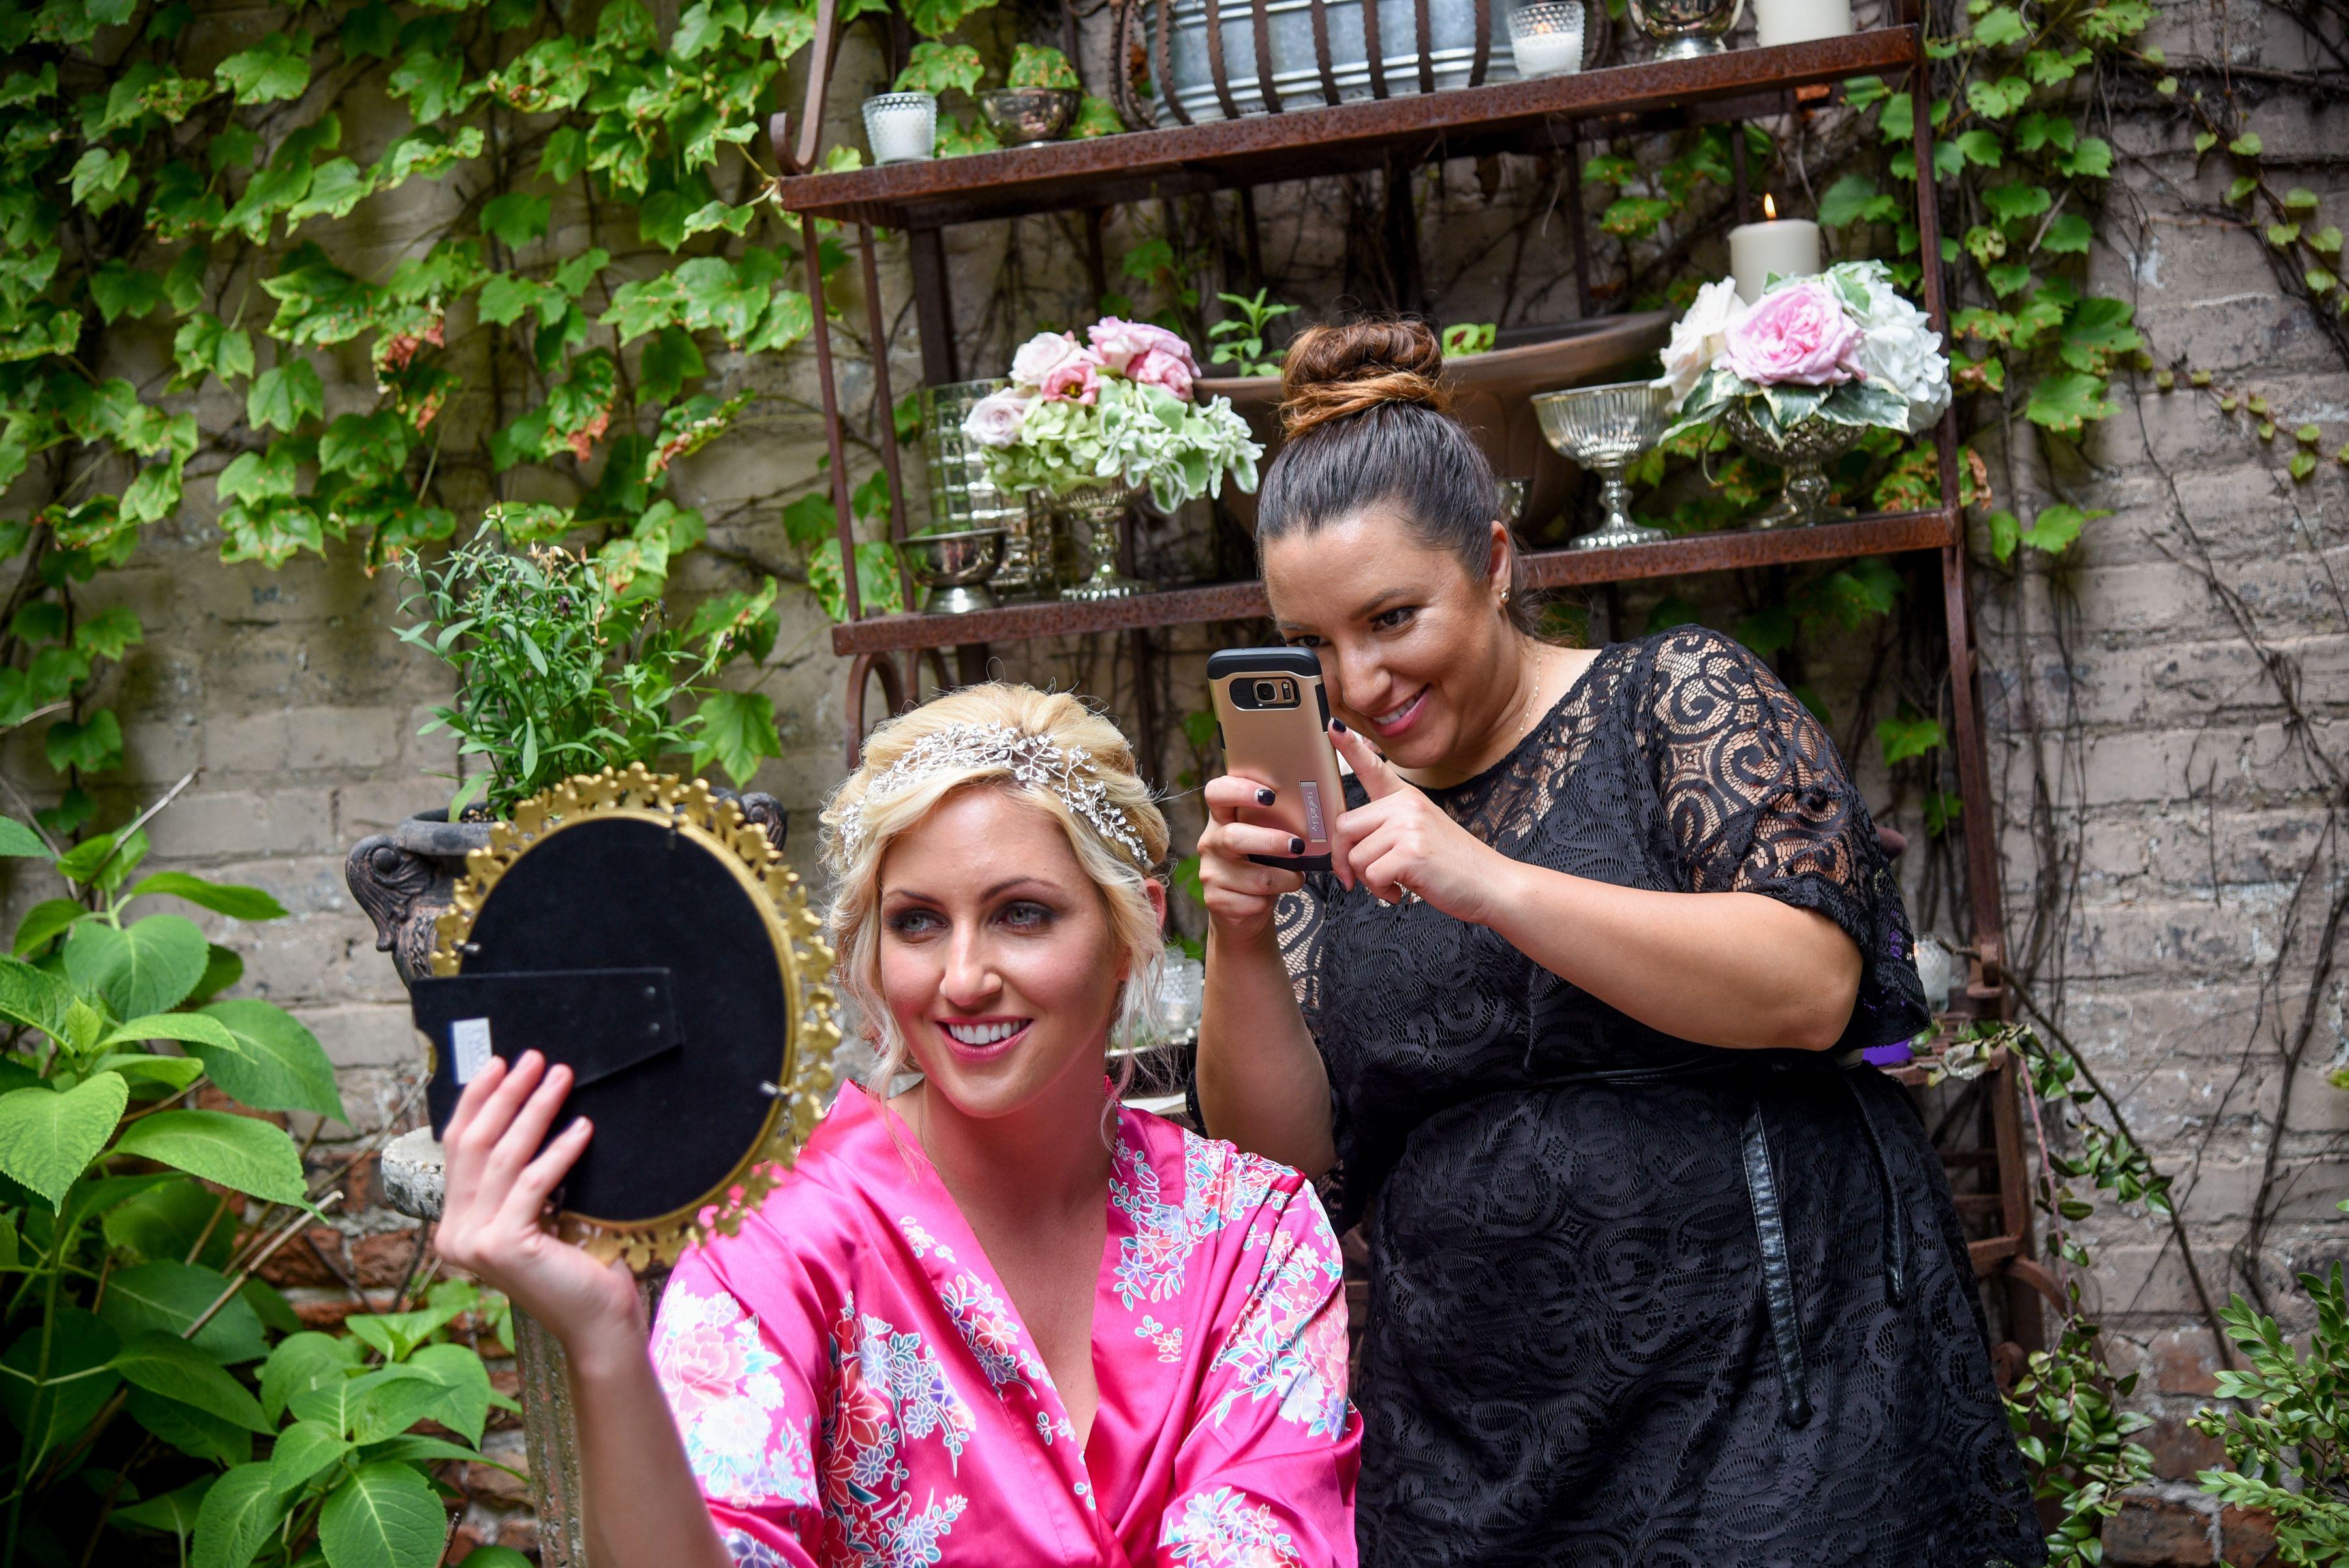 Bride And Groomsmen Suits By Formally Modern Wedding Dresses Lace Mermaid Wedding Dress Wedding Dresses